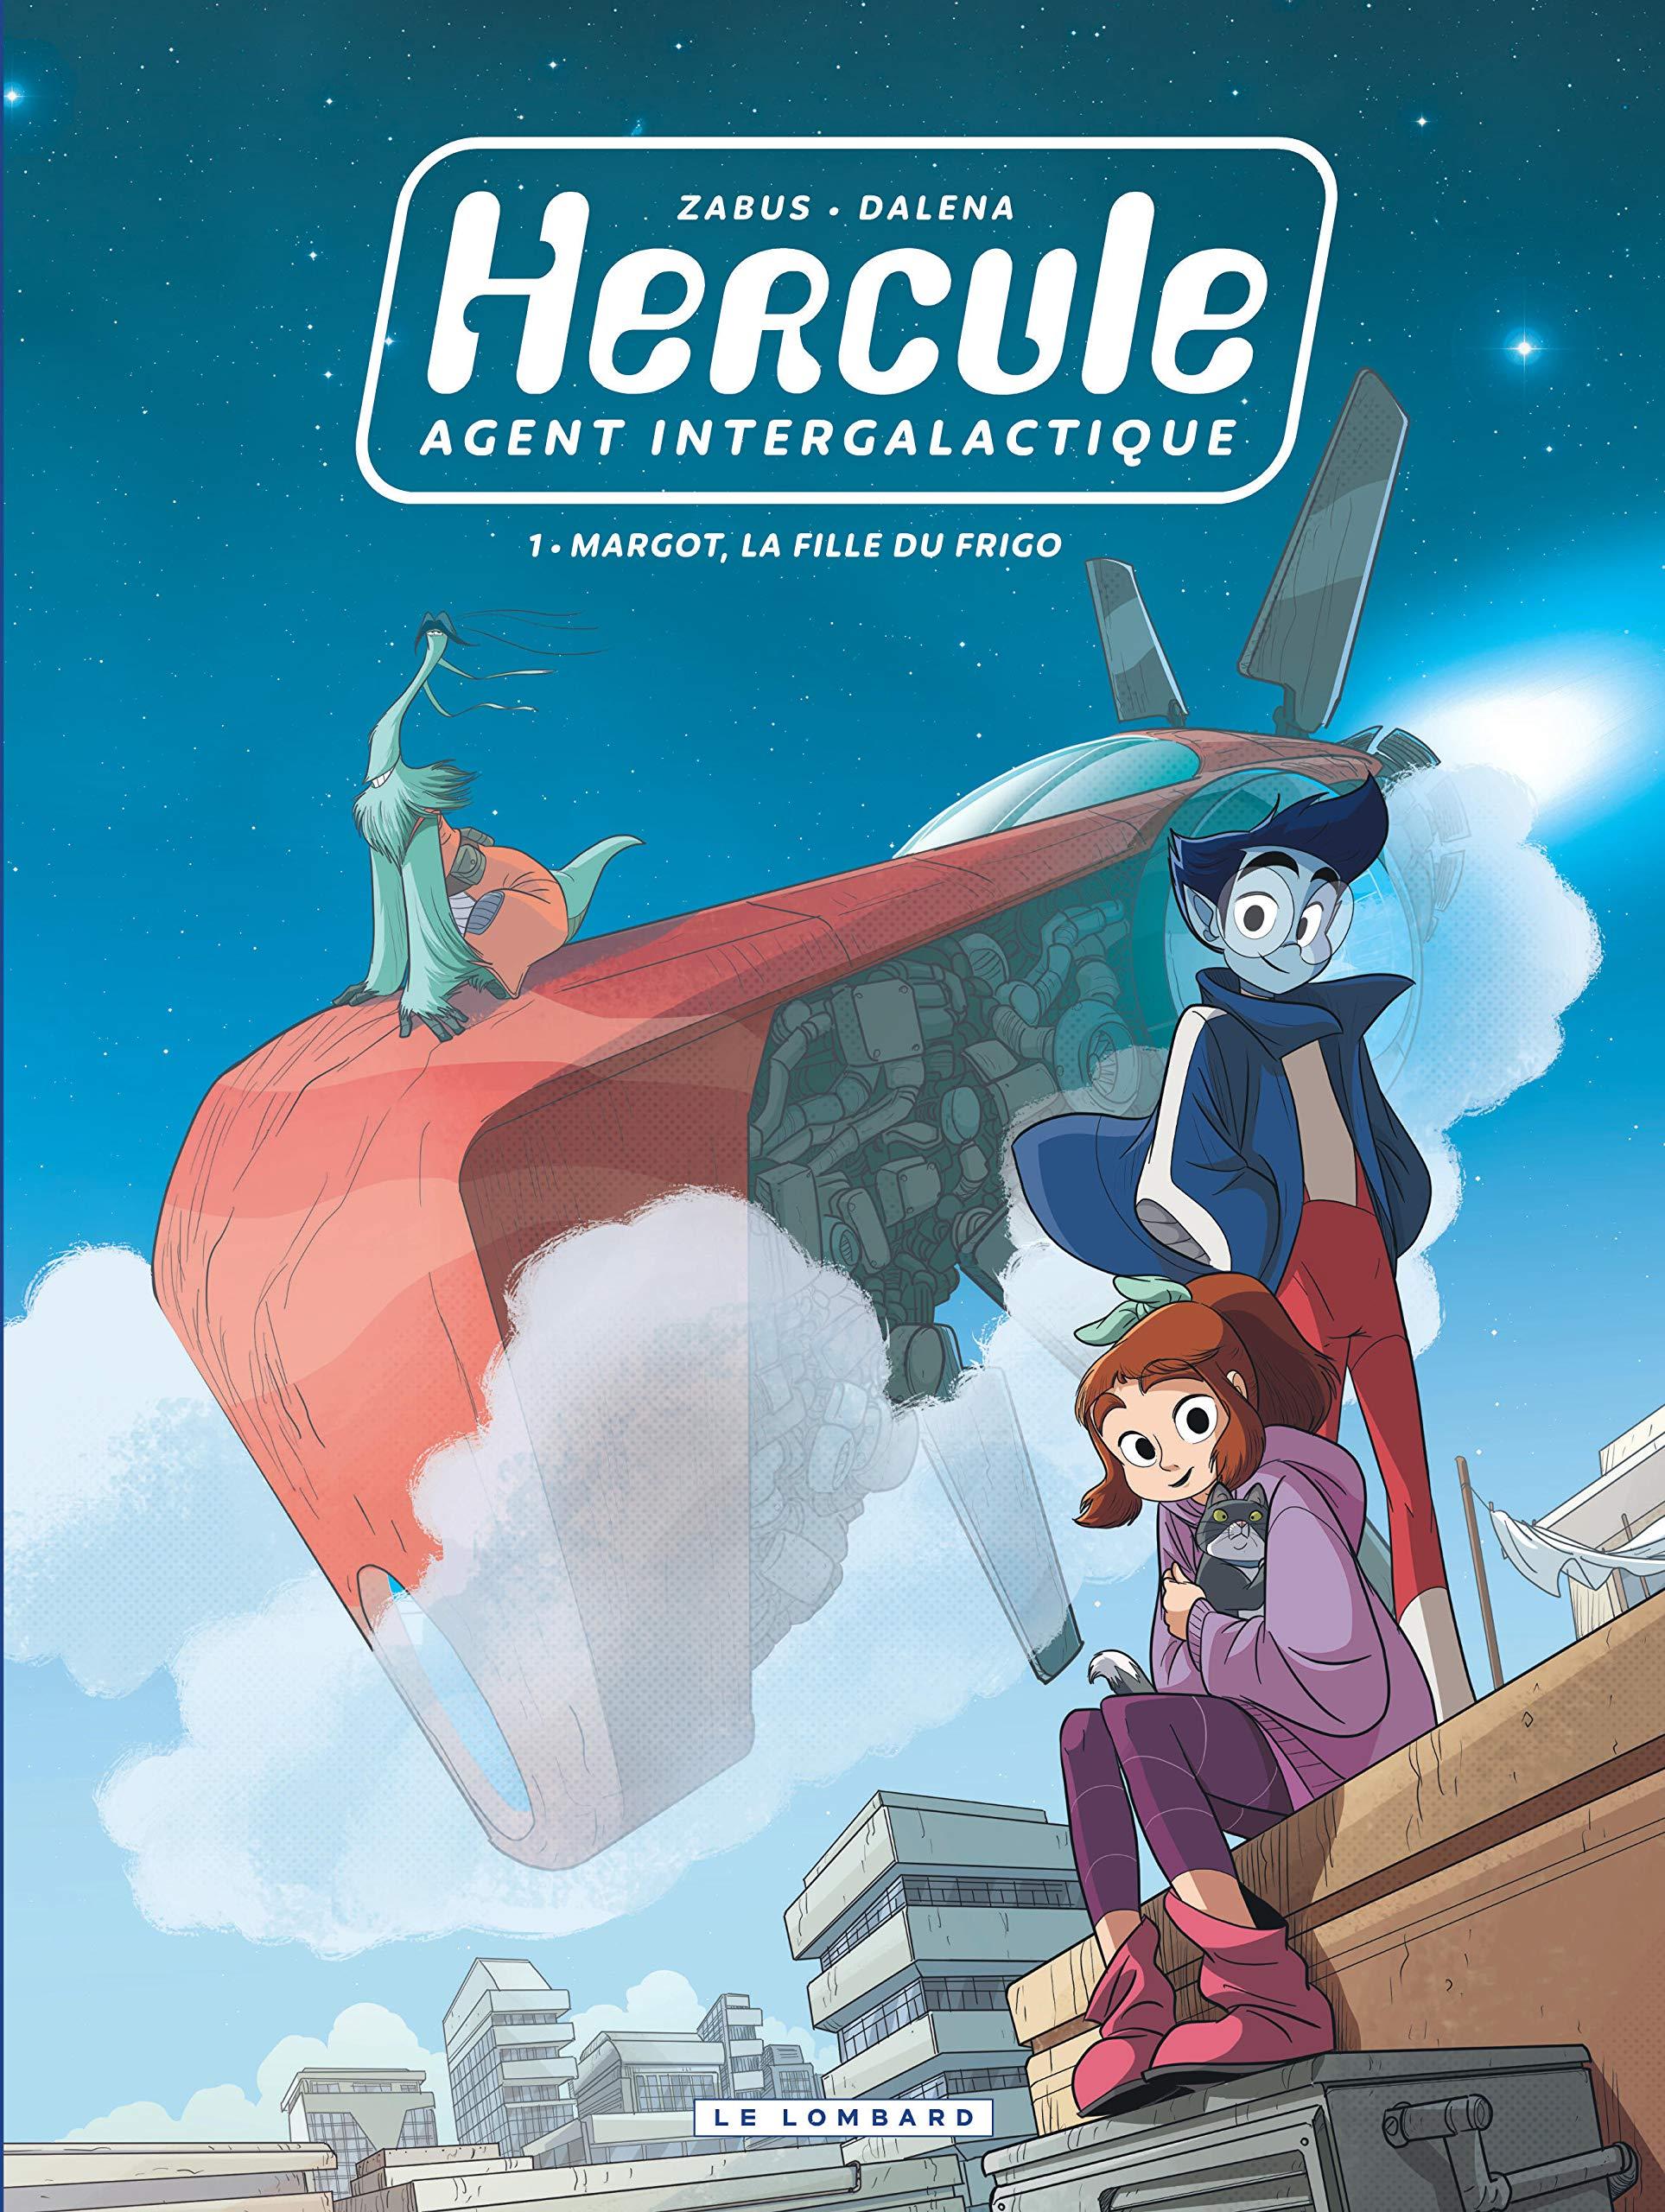 Hercule, agent intergalactique 1 - Margot, la fille du frigo